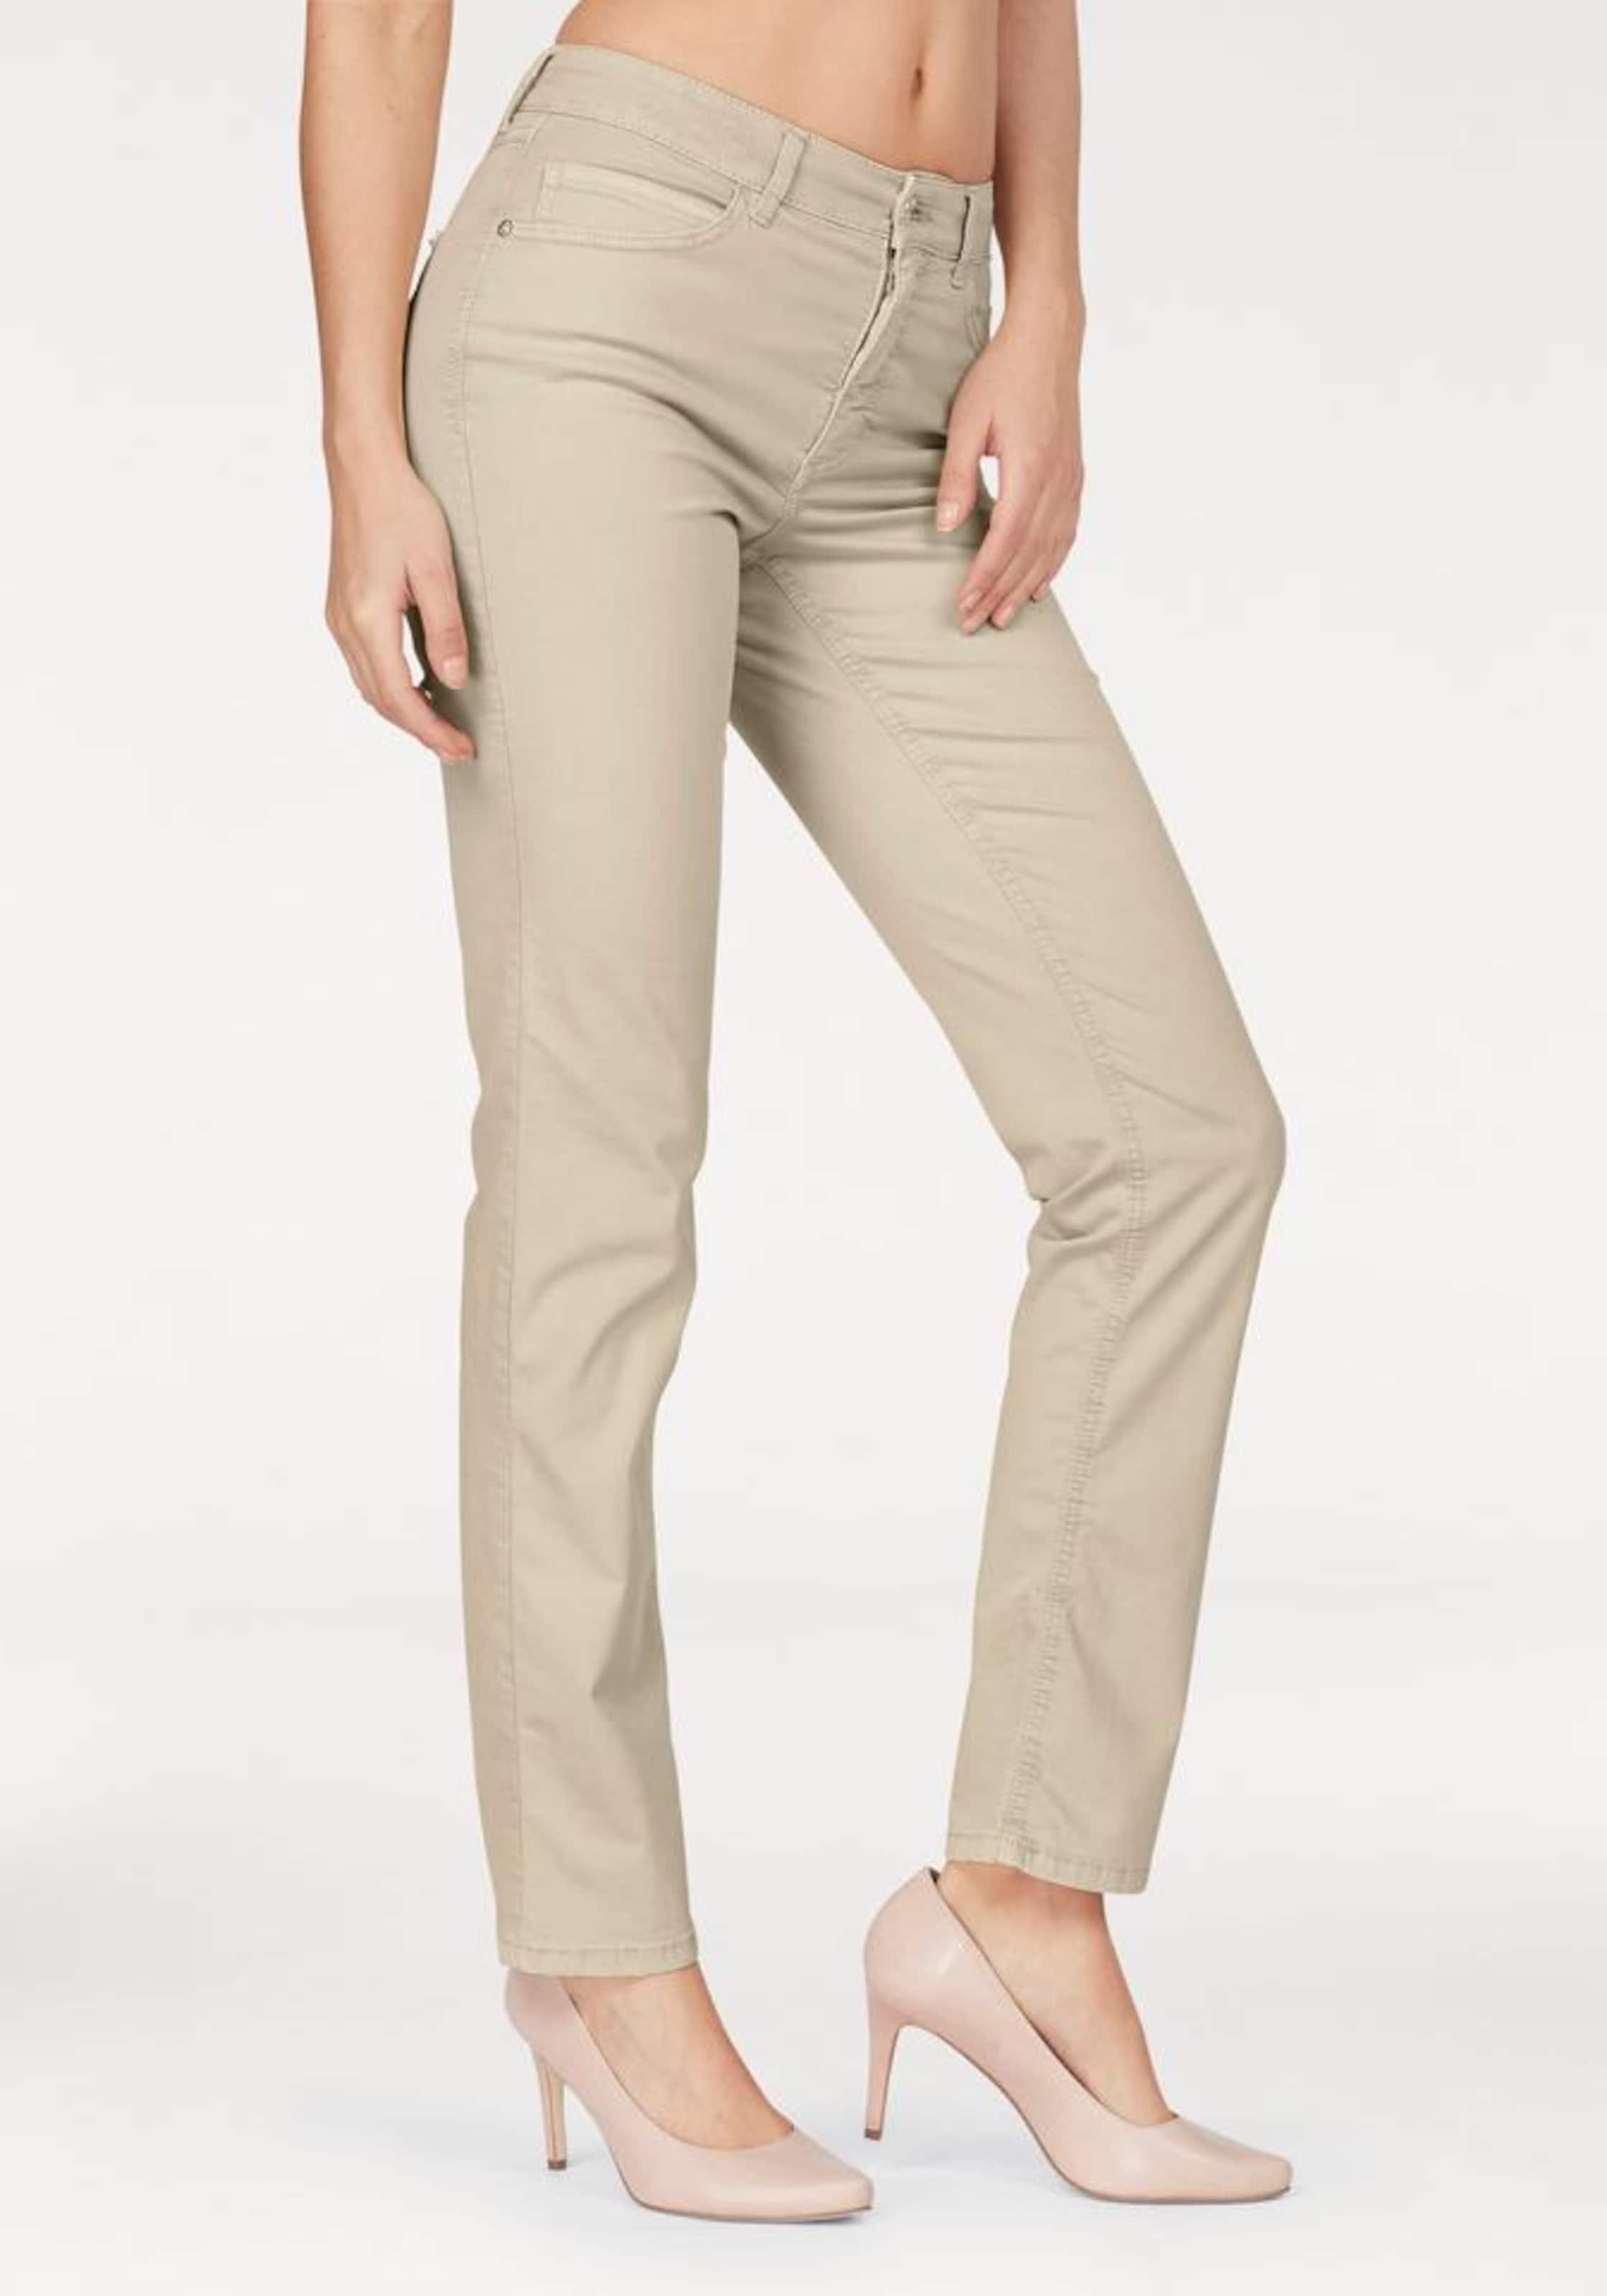 Jeans In Bequeme 'stella' Mac Beige w8nOmNv0